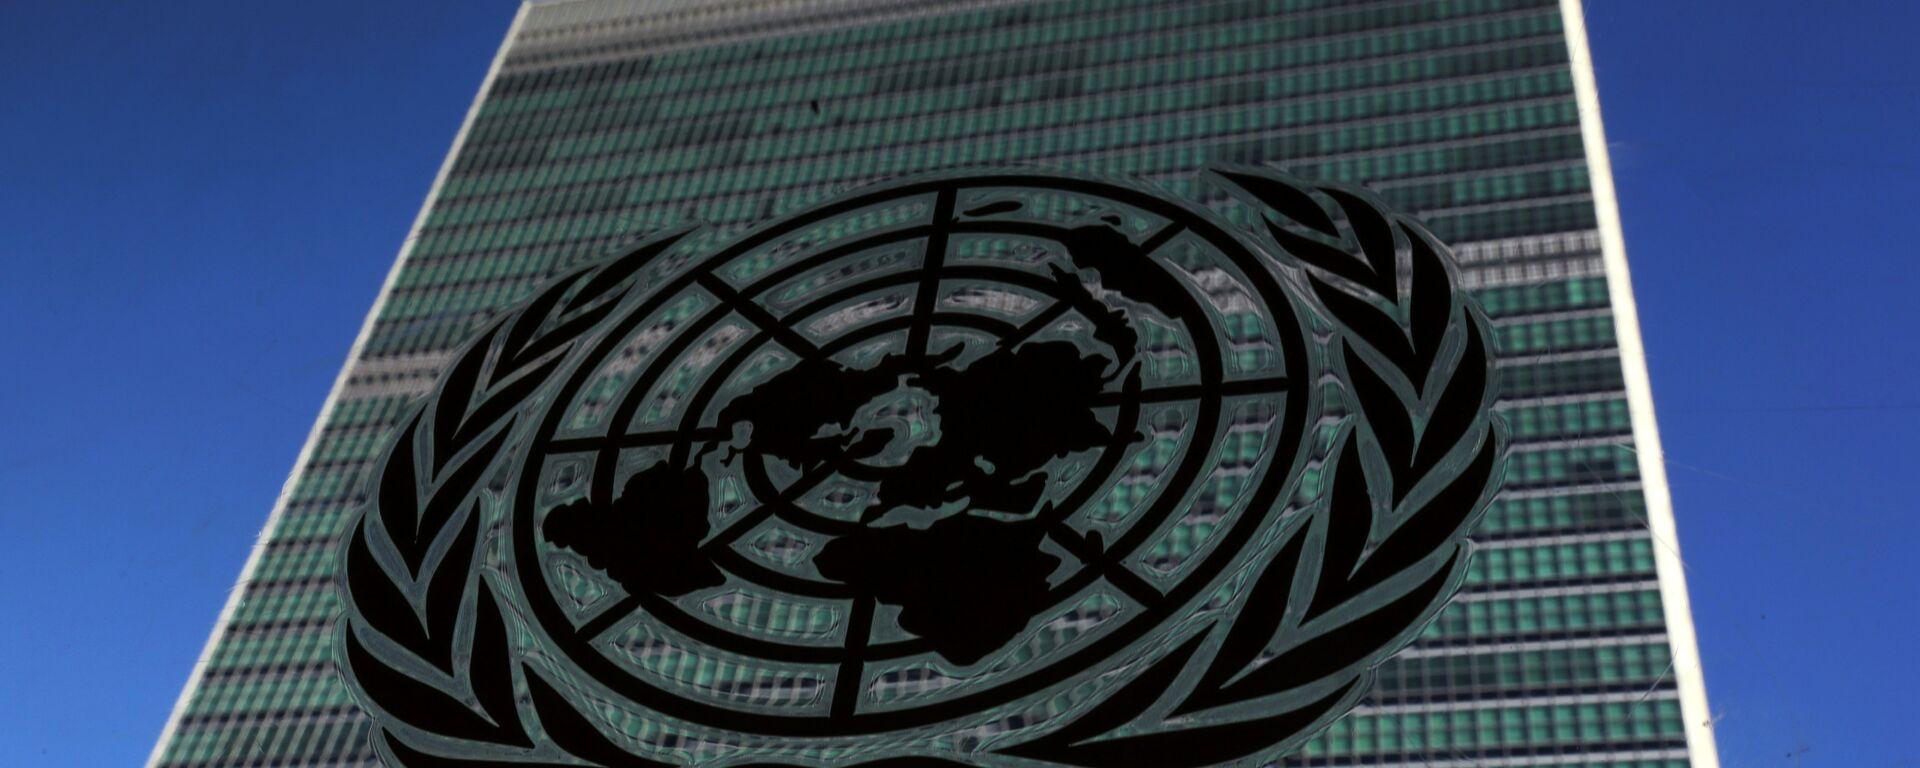 La sede de la ONU - Sputnik Mundo, 1920, 24.06.2021